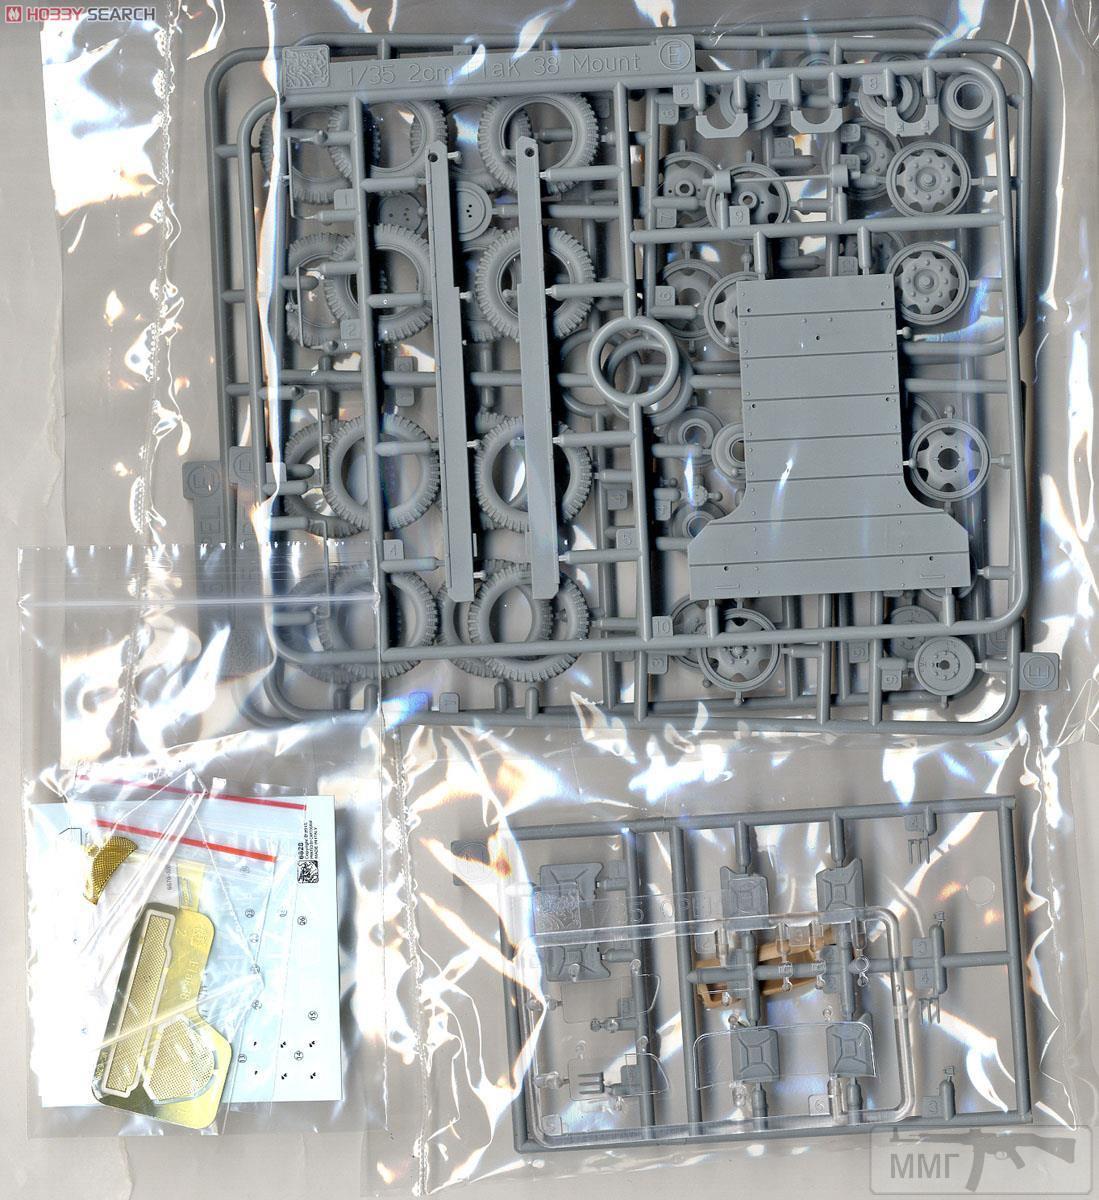 55842 - Обзор моделей и афтемаркета.